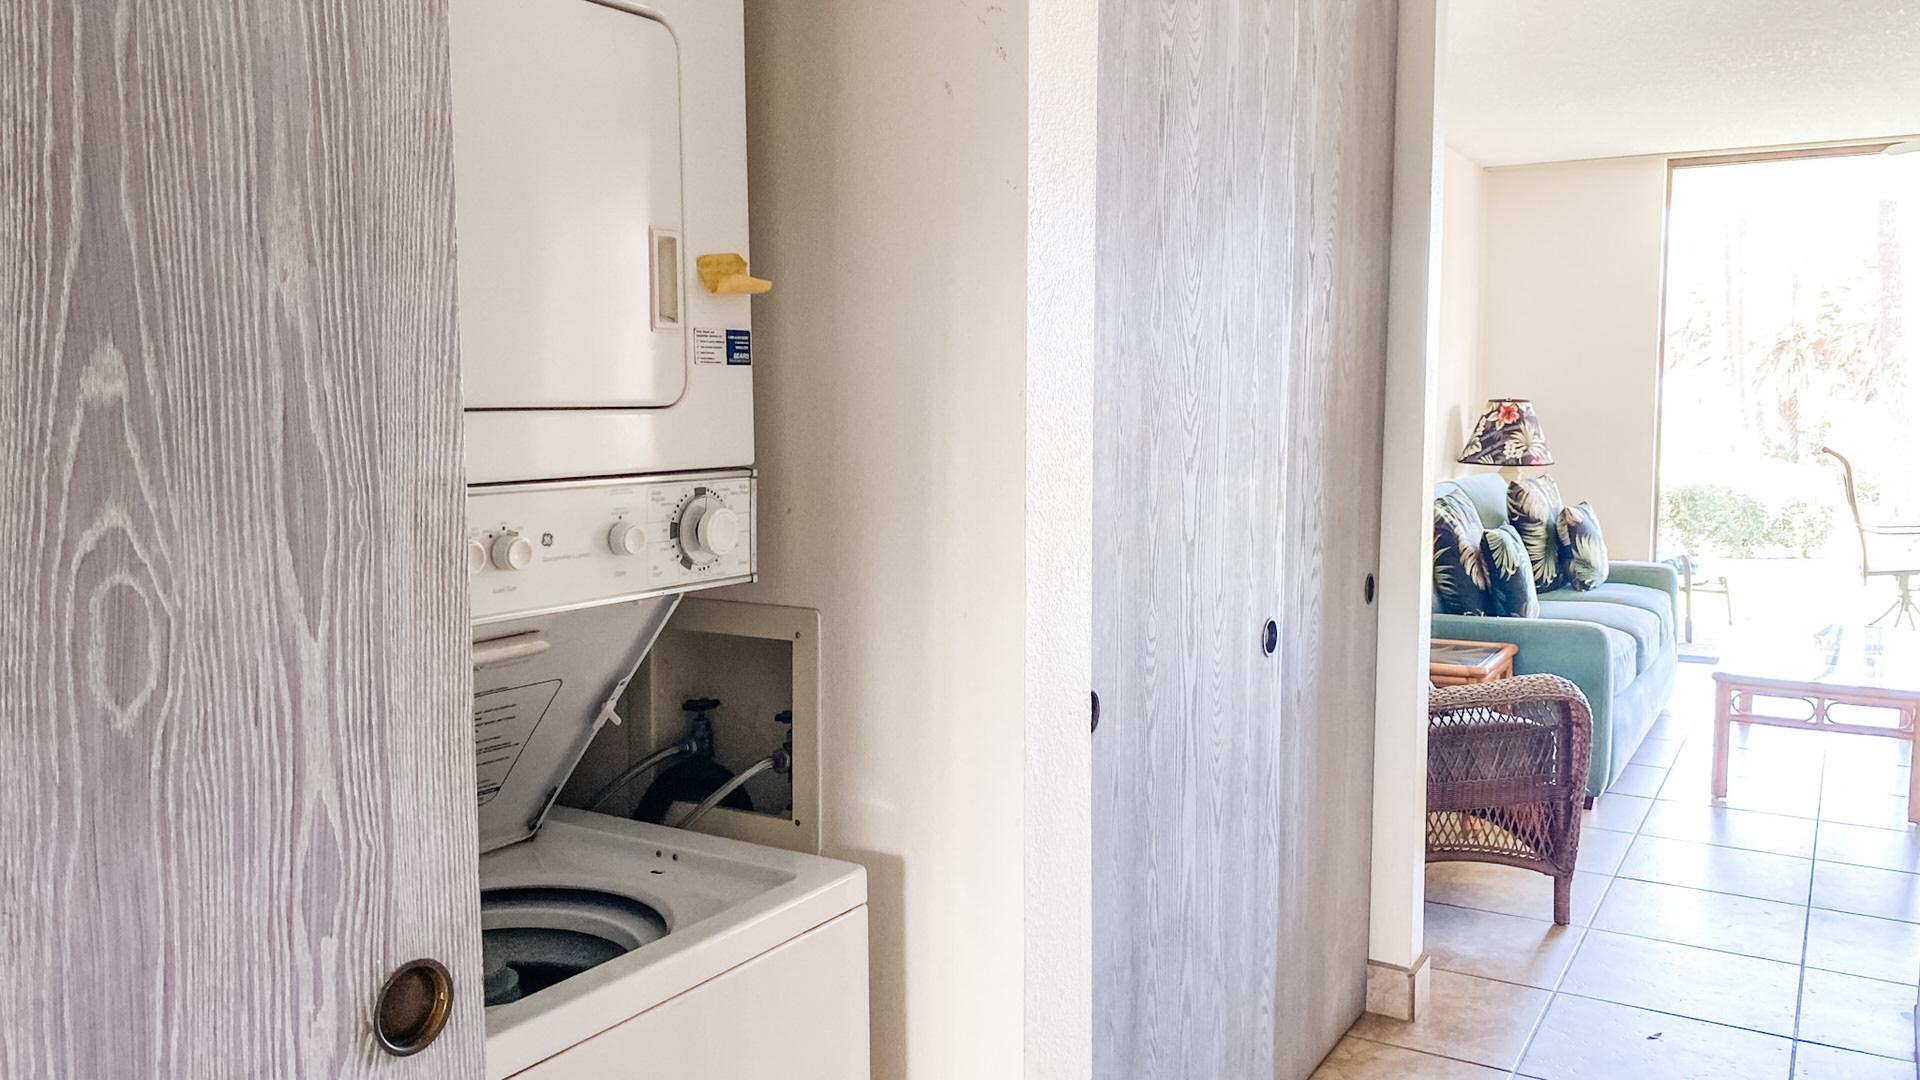 A107 Laundry